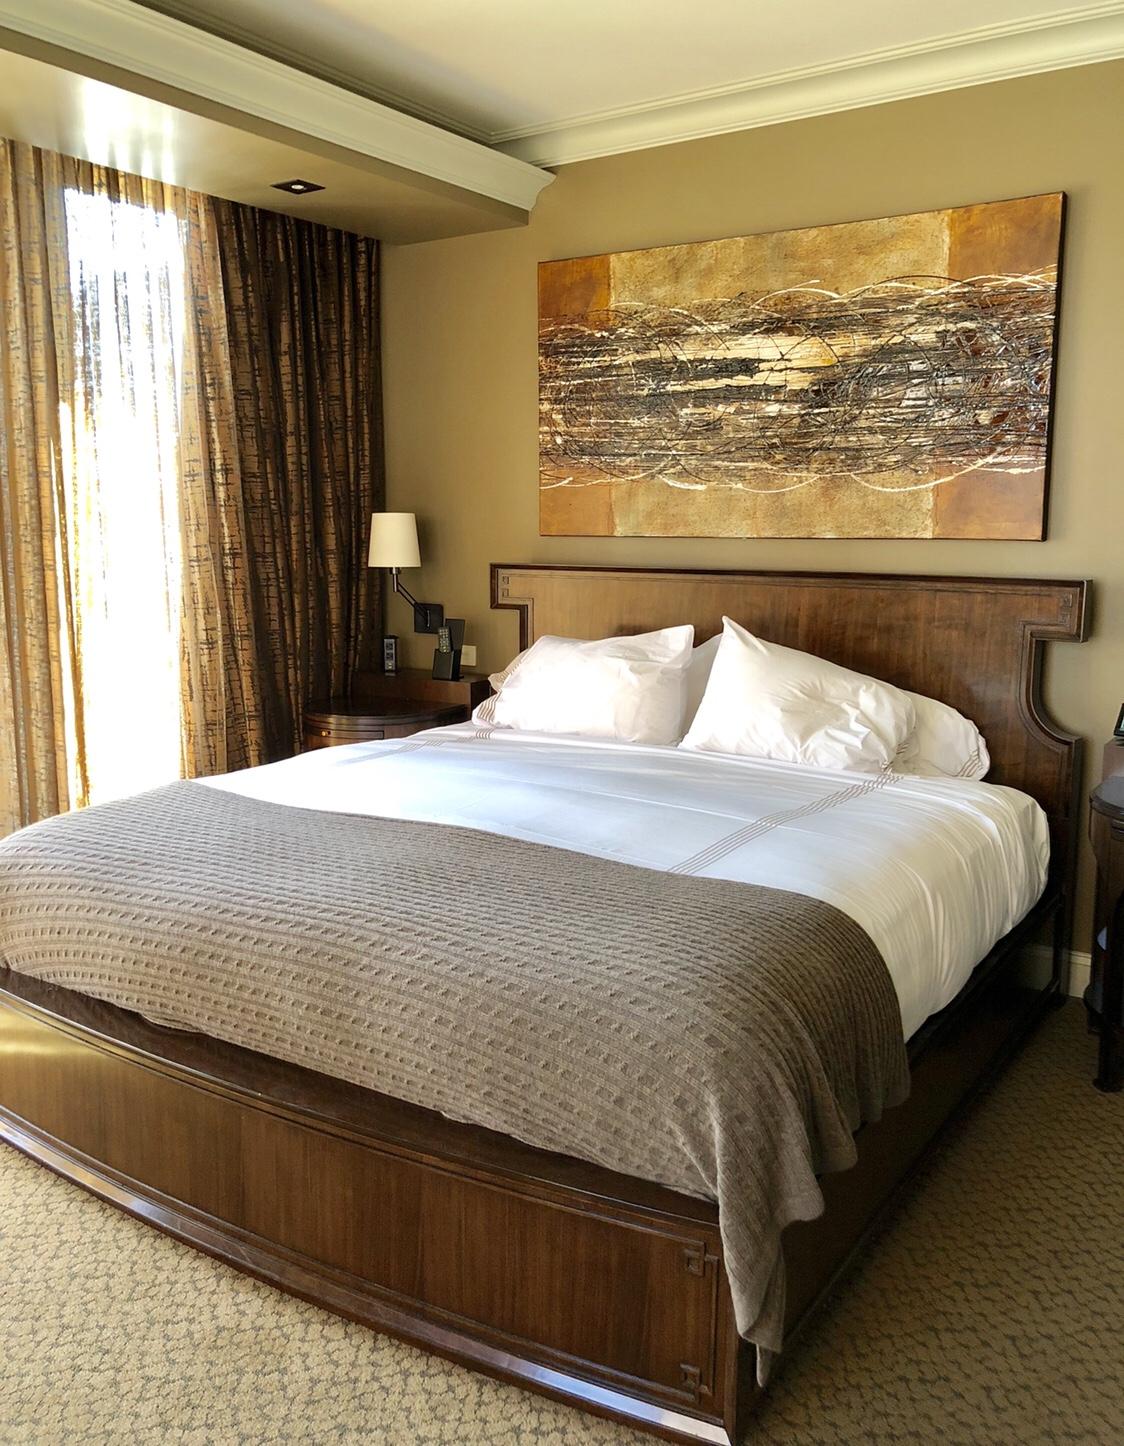 Curtiss Hotel | Buffalo, NY #curtisshotel #buffalo #buffalony #westernny #luxuryhotel